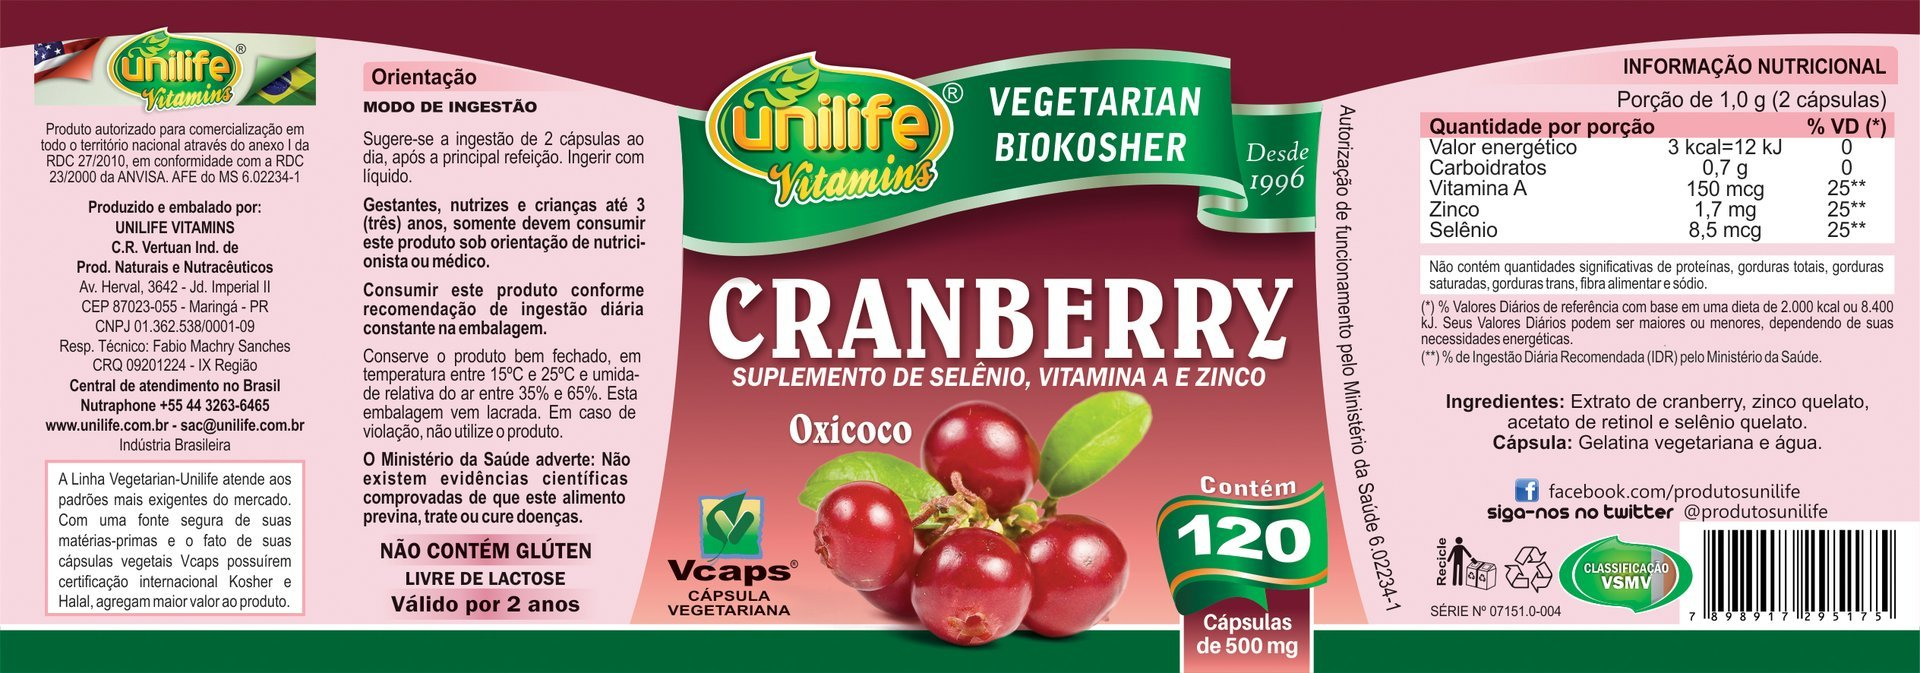 cranberry-capsulas-unilife